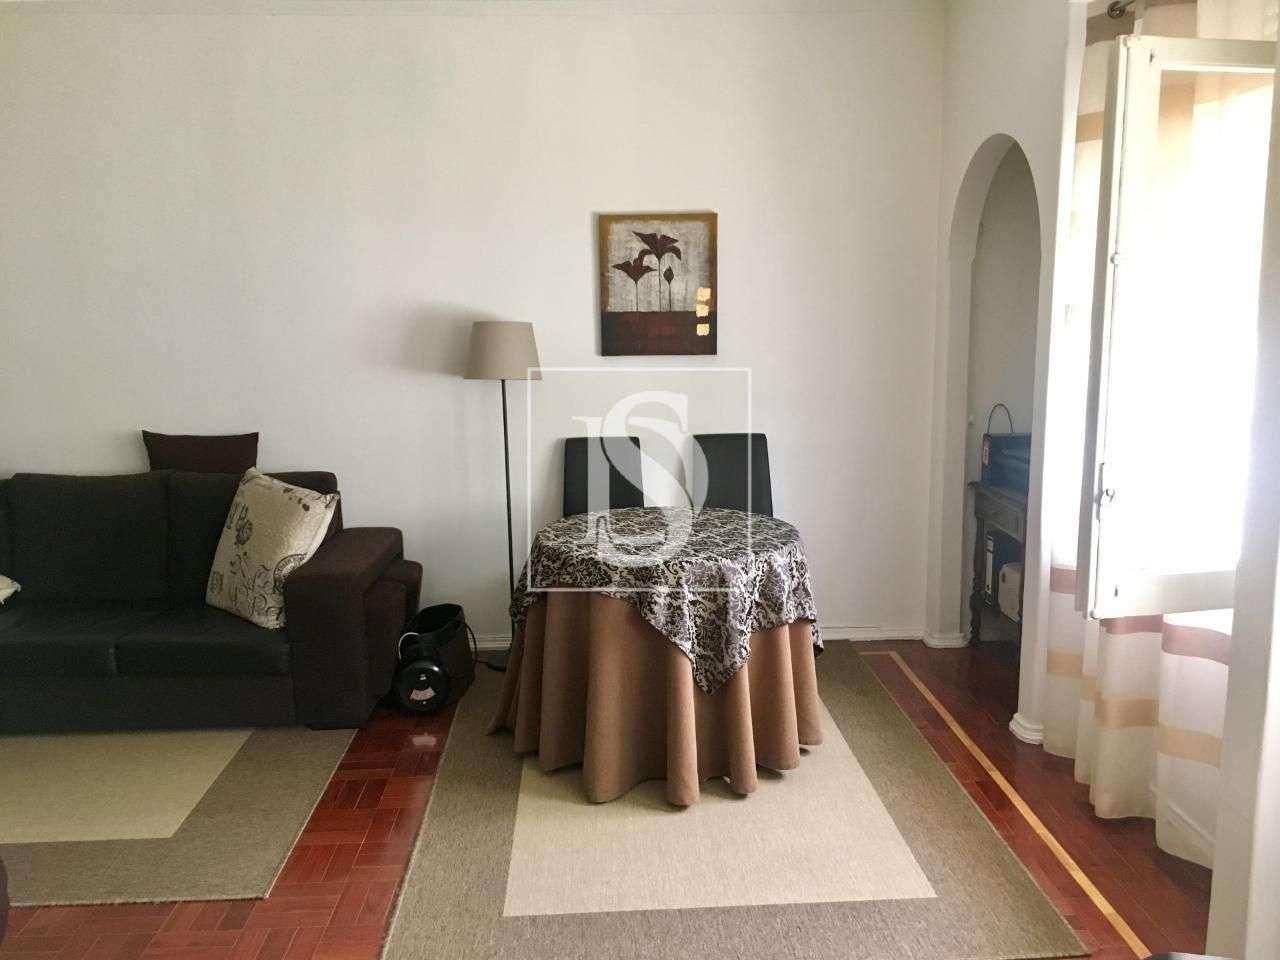 Apartamento para arrendar, Falagueira-Venda Nova, Lisboa - Foto 4